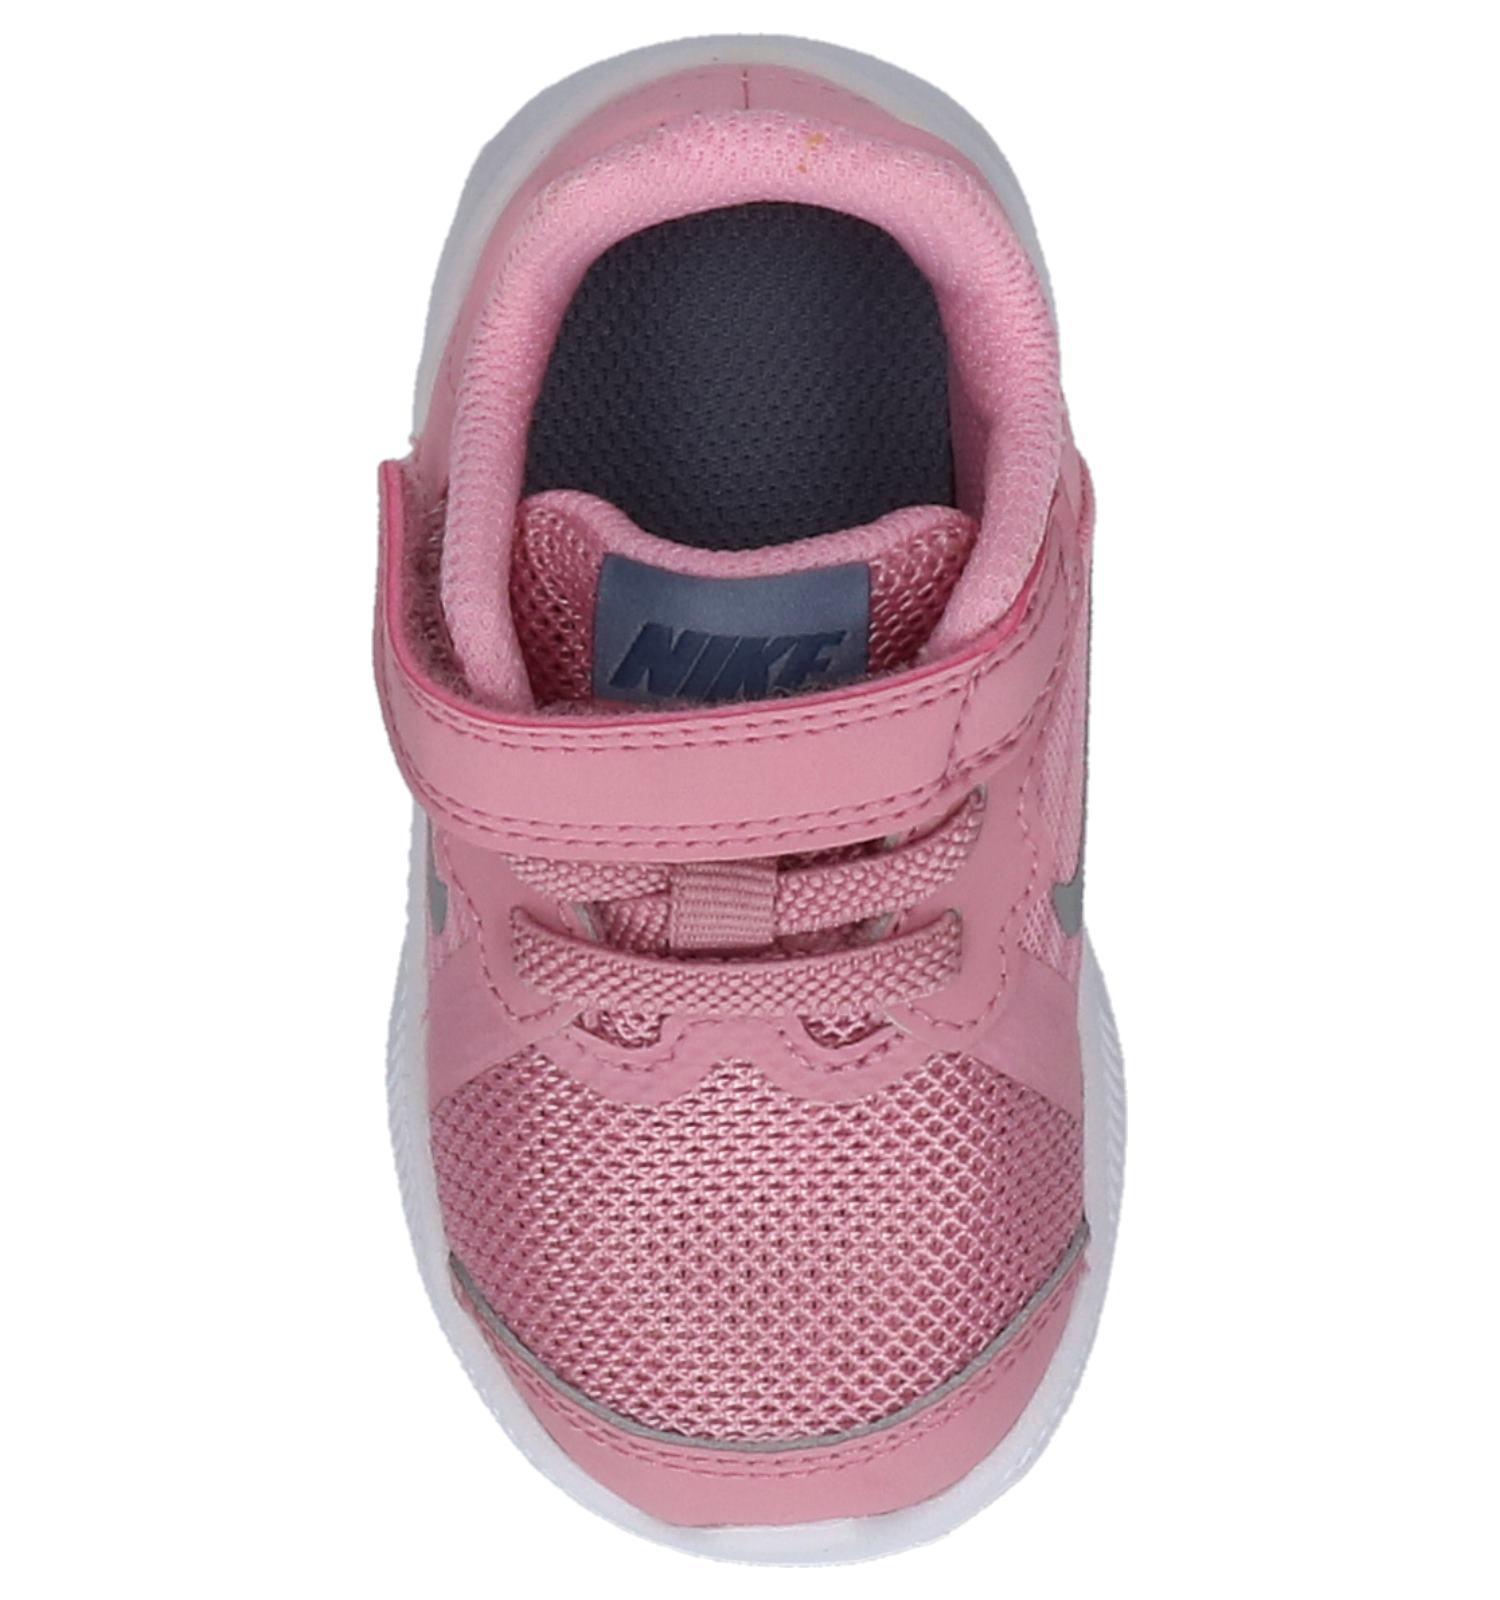 sale retailer d846b bb7f6 Babysneakers Lichtroze Nike Downshifter 8   TORFS.BE   Gratis verzend en  retour